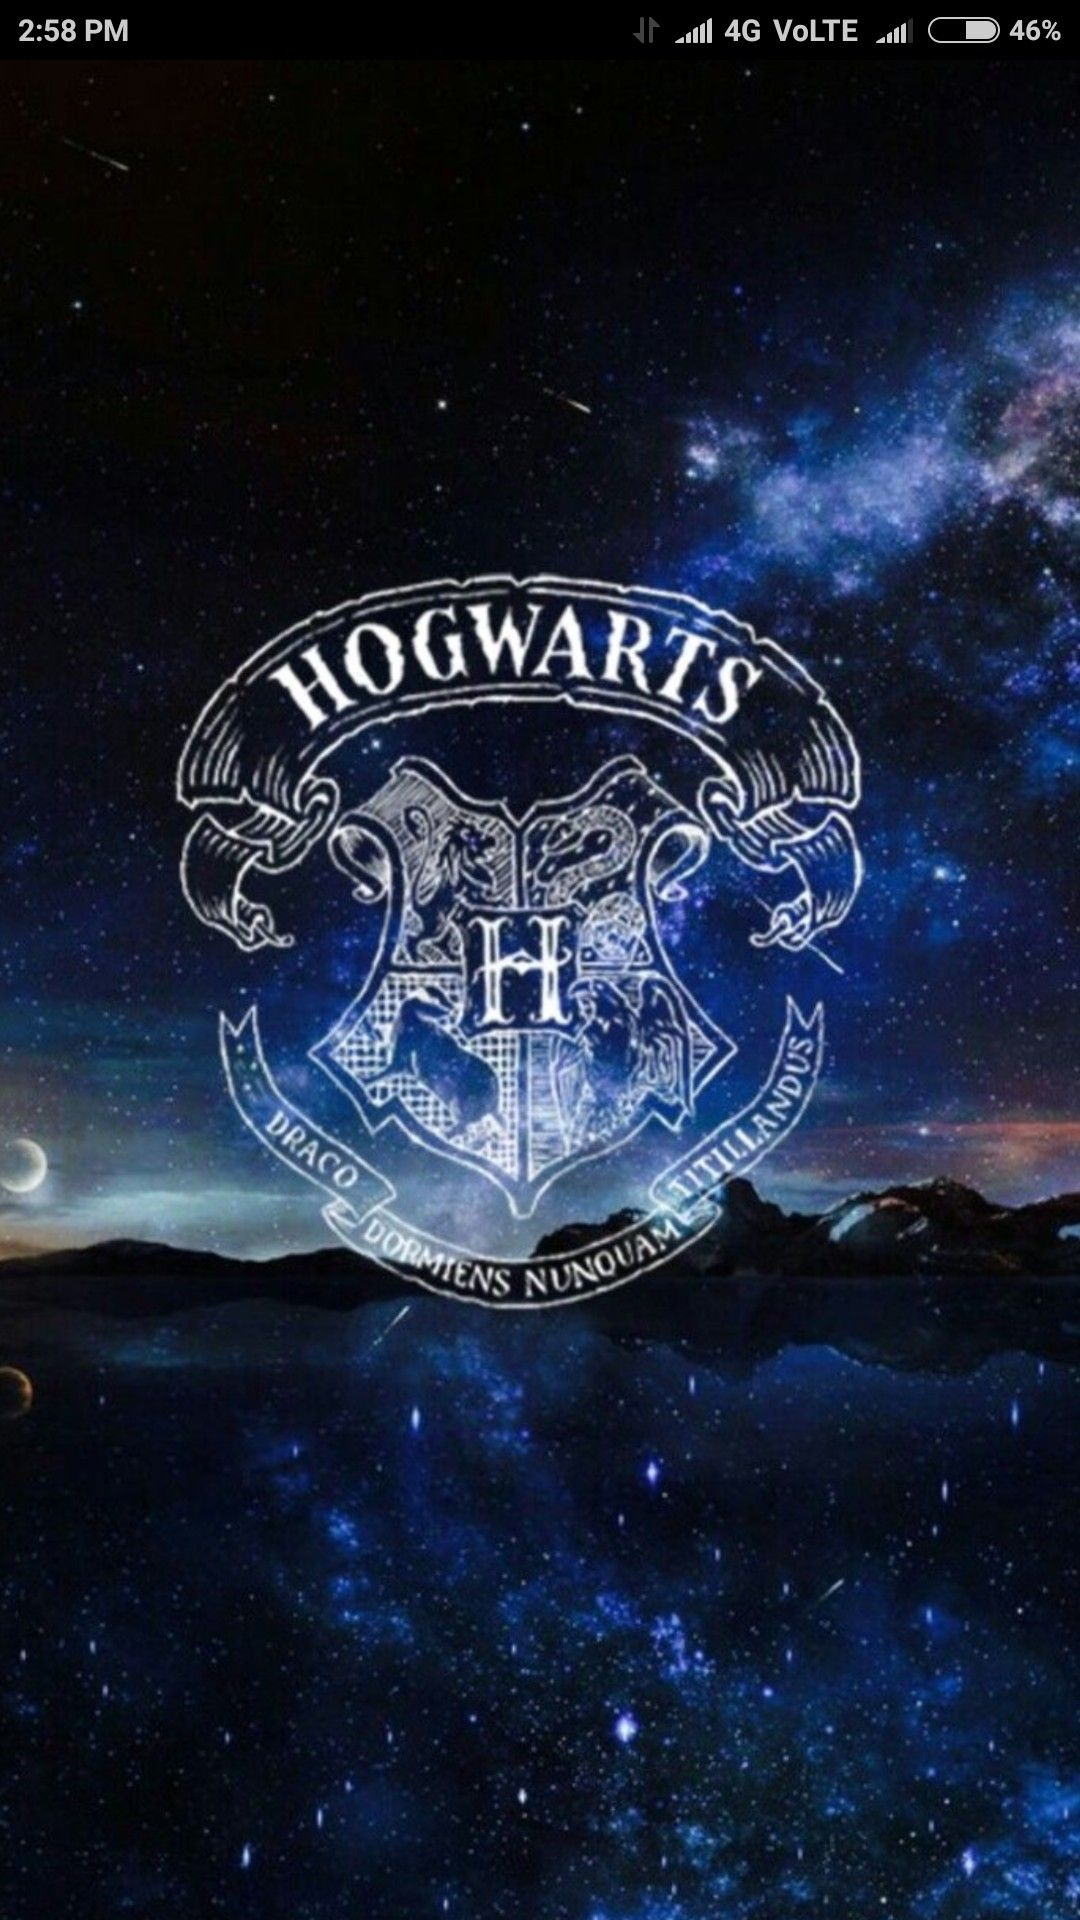 Cuz I Harry Potter Harry Potter Fanfiction Harry Potter Film Harry Potter Hintergrund